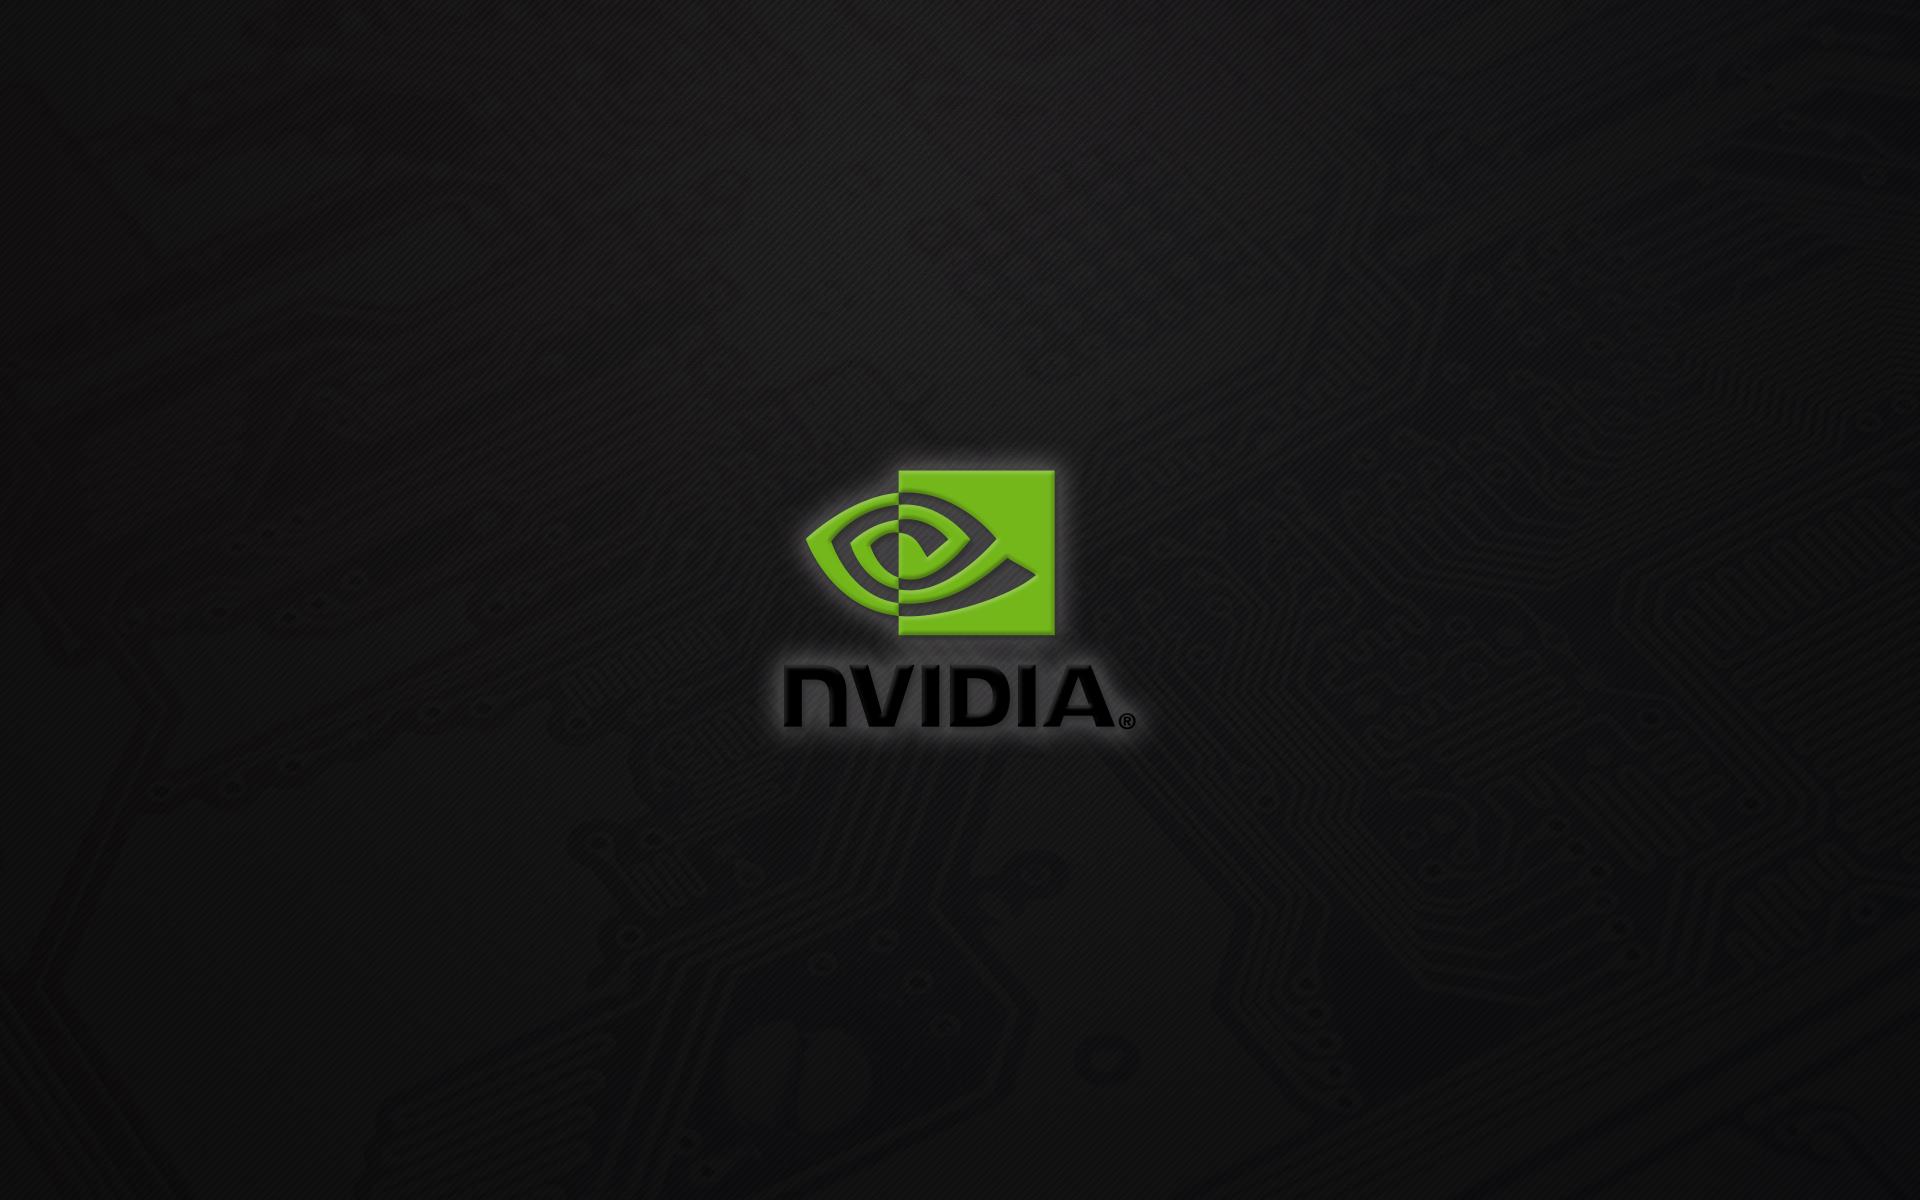 General 1920x1200 Nvidia logo minimalism